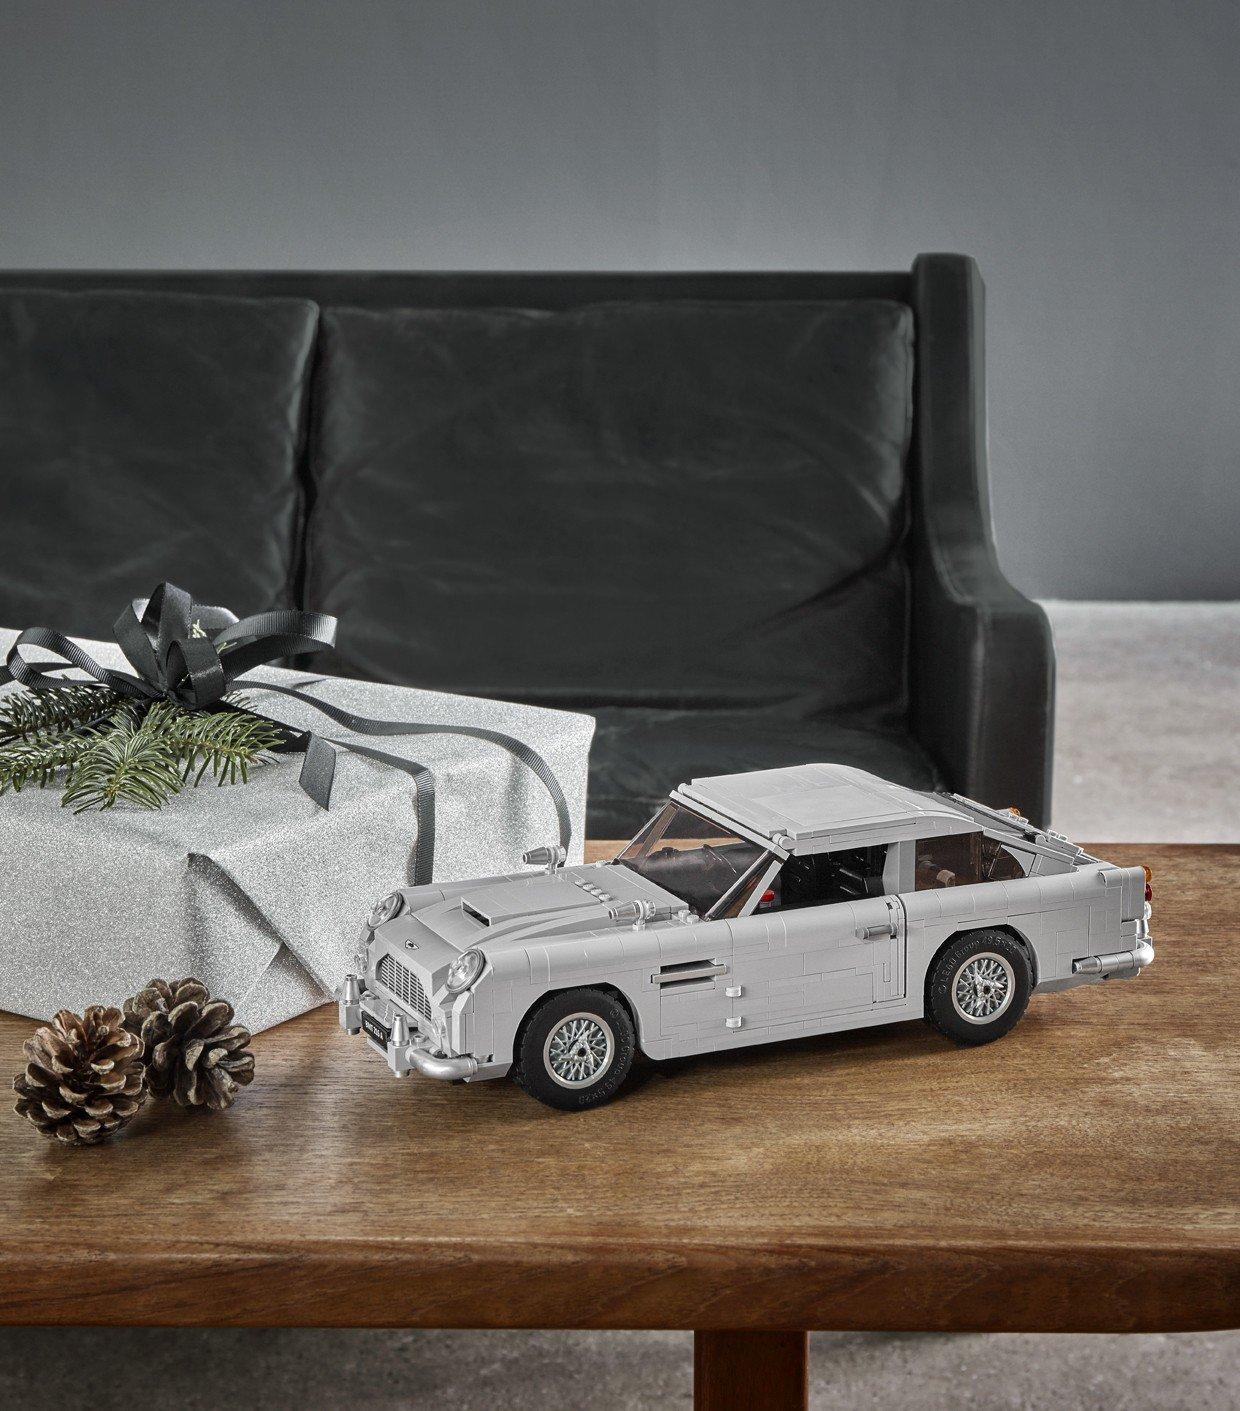 Lego Aston Martin DB5 (39)